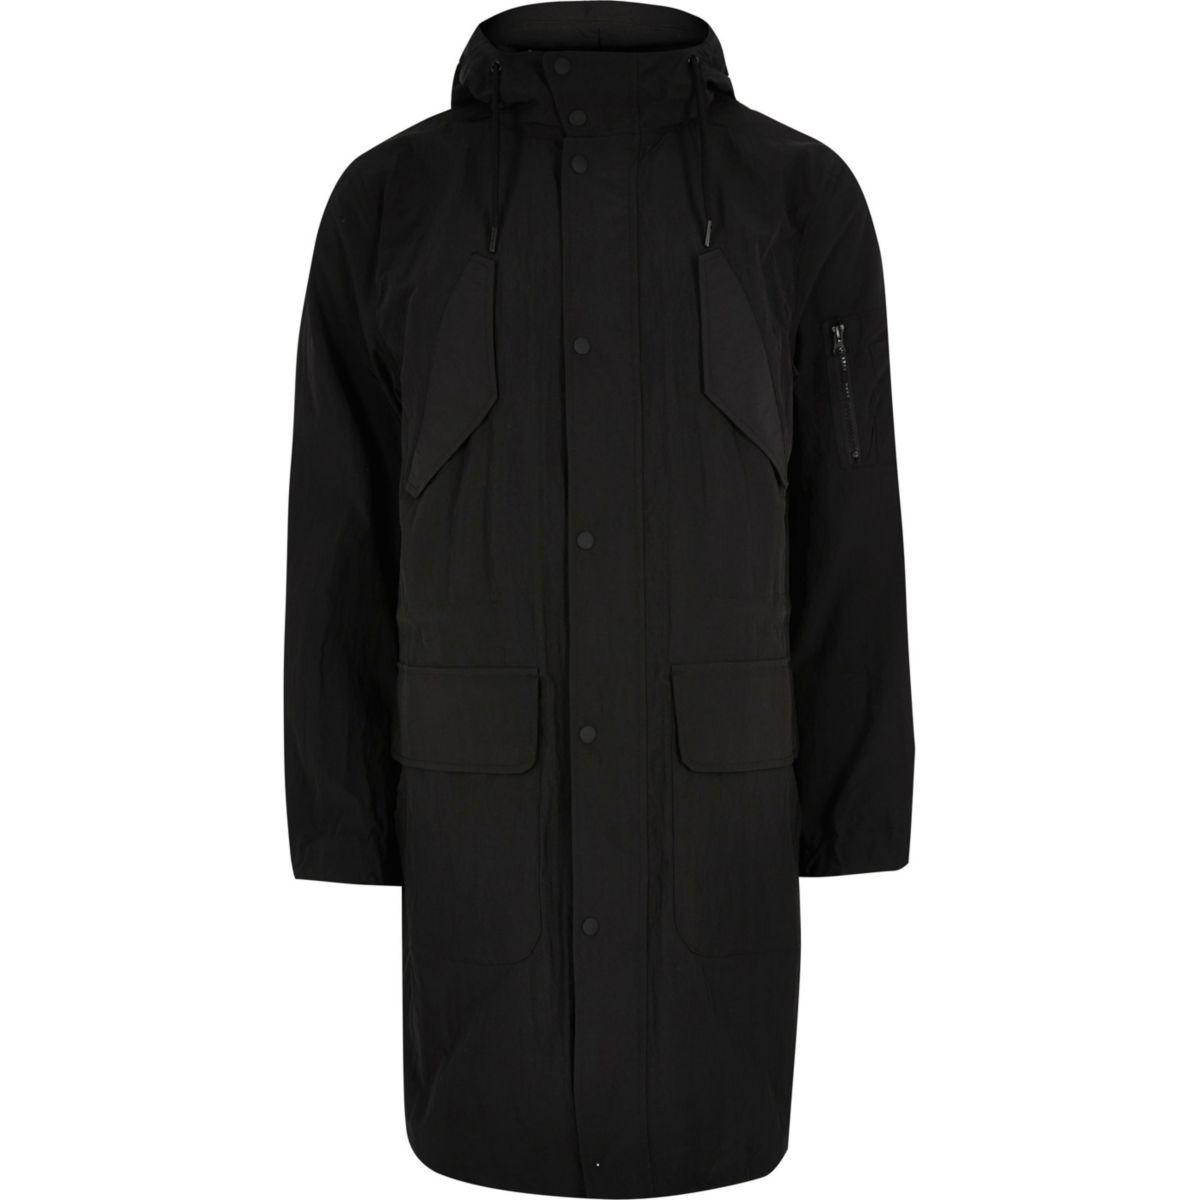 Big and Tall black lightweight parka coat